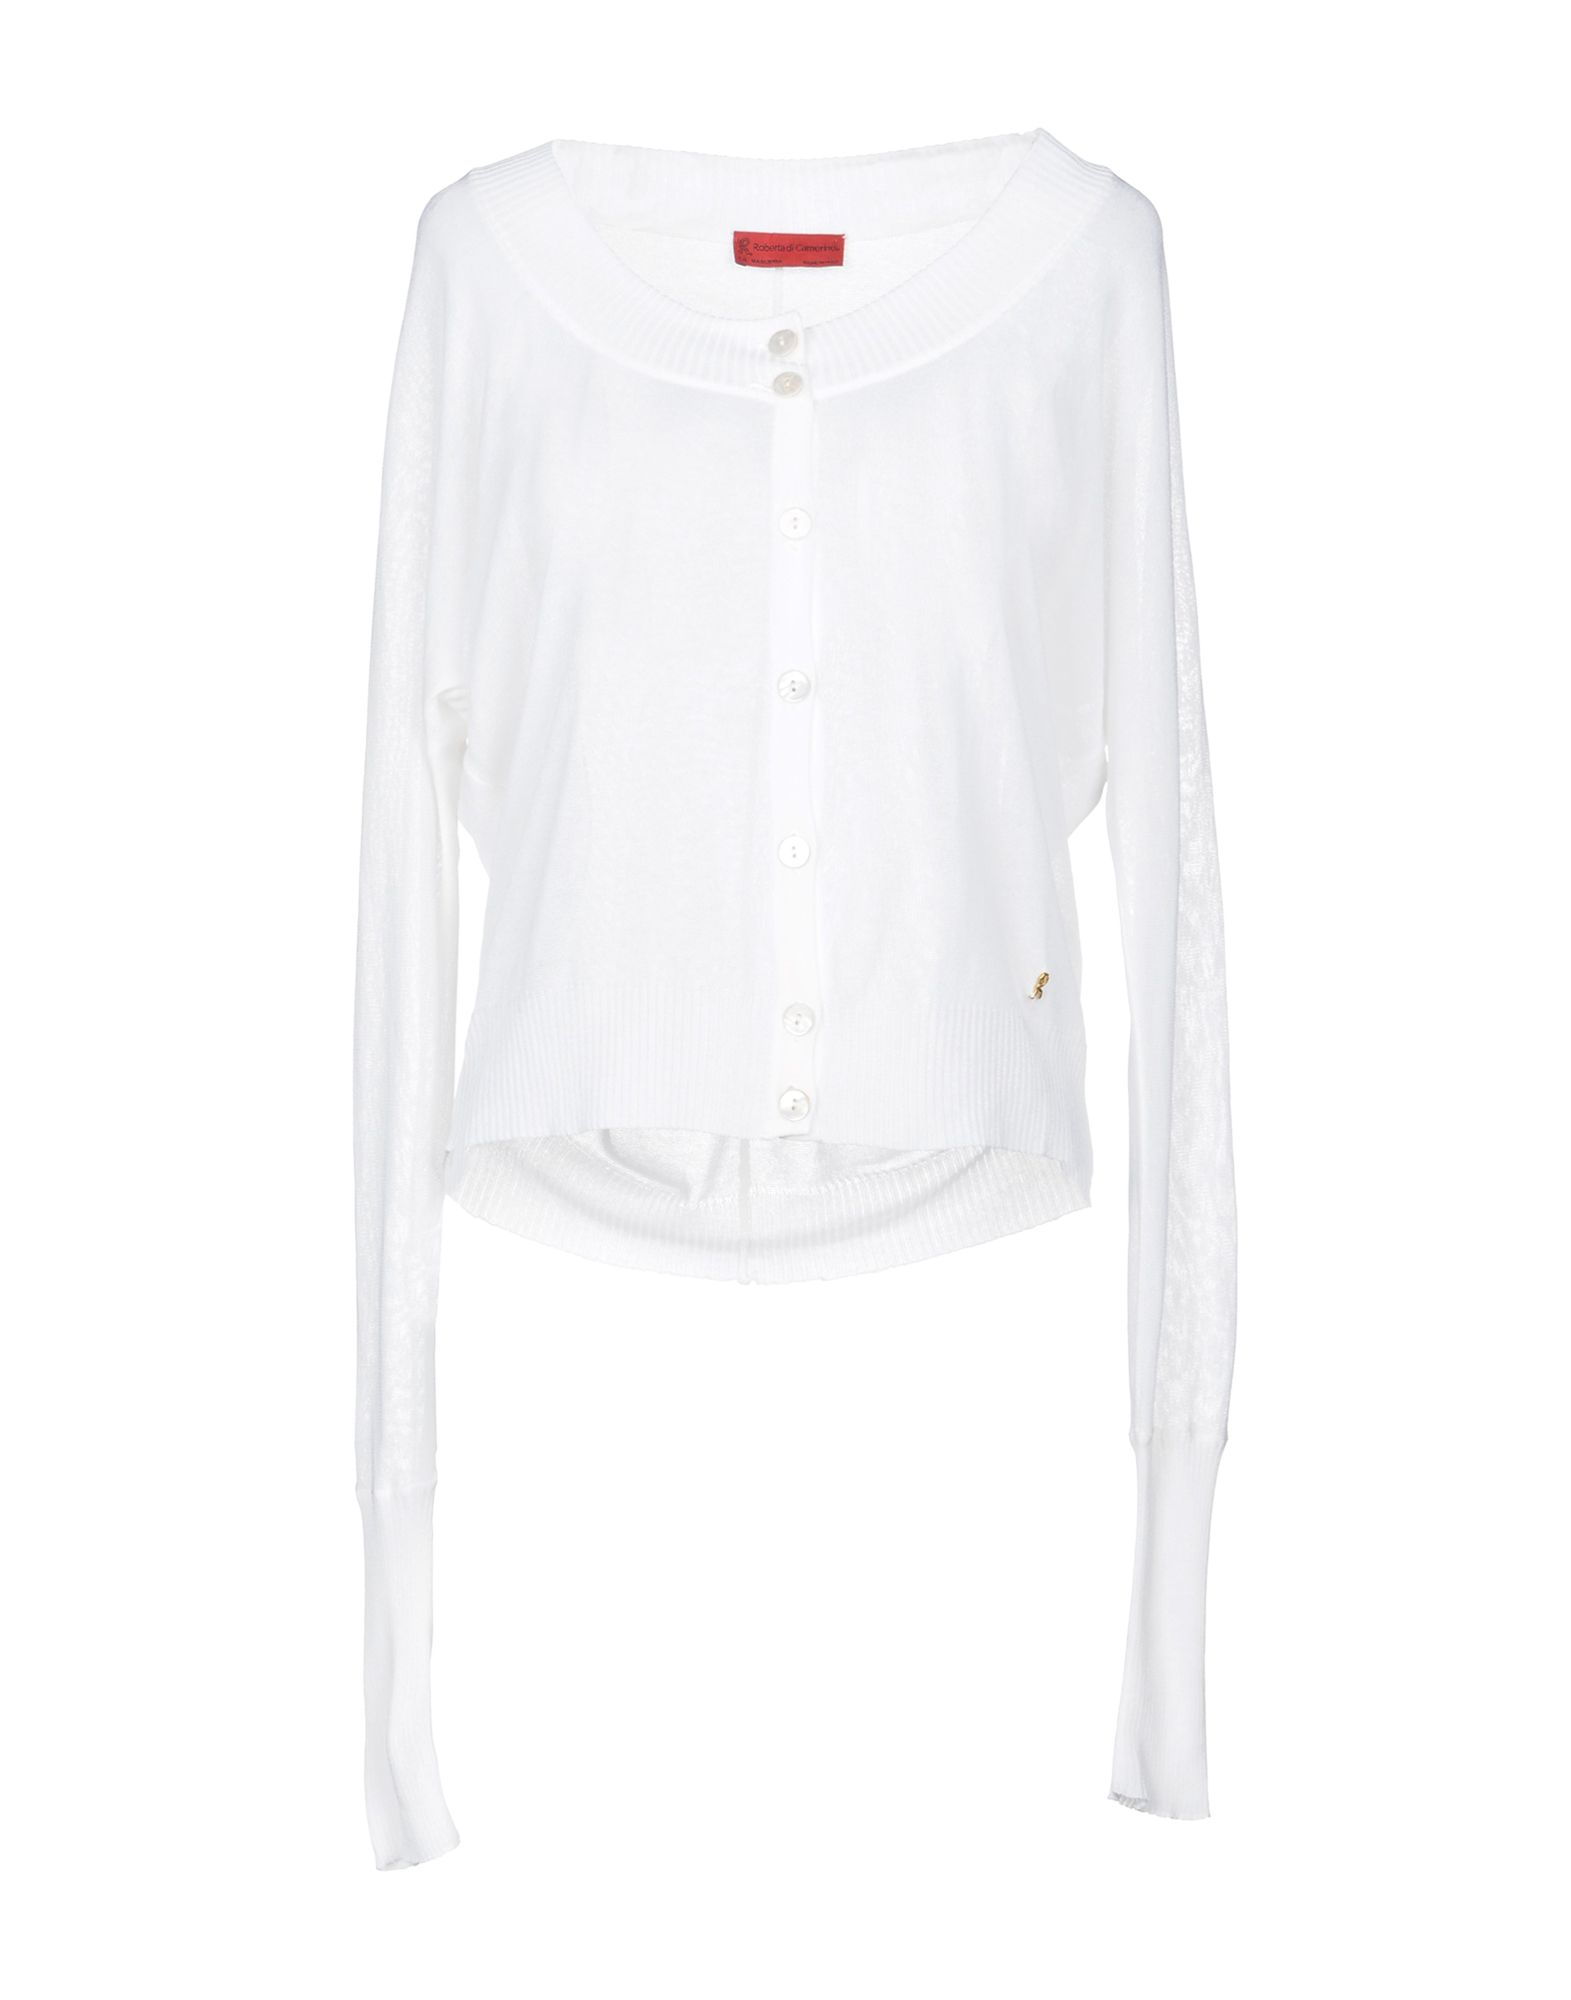 ROBERTA DI CAMERINO Cardigan in White